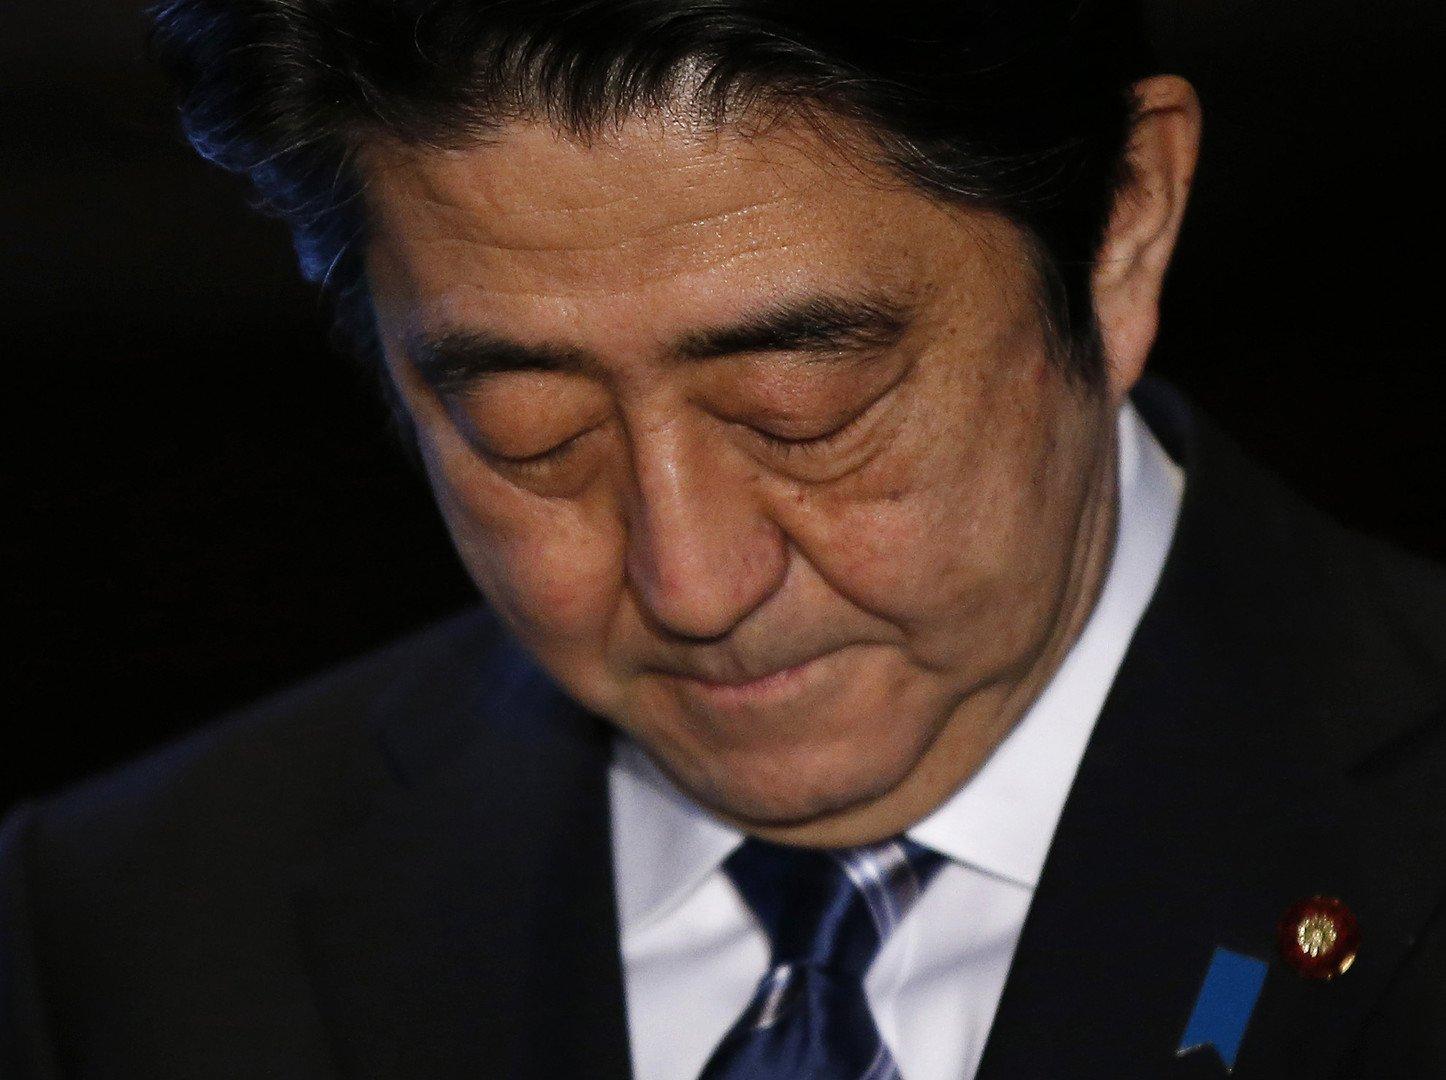 Le premier-ministre japonais Shinzo Abe. ( REUTERS/Toru Hanai )